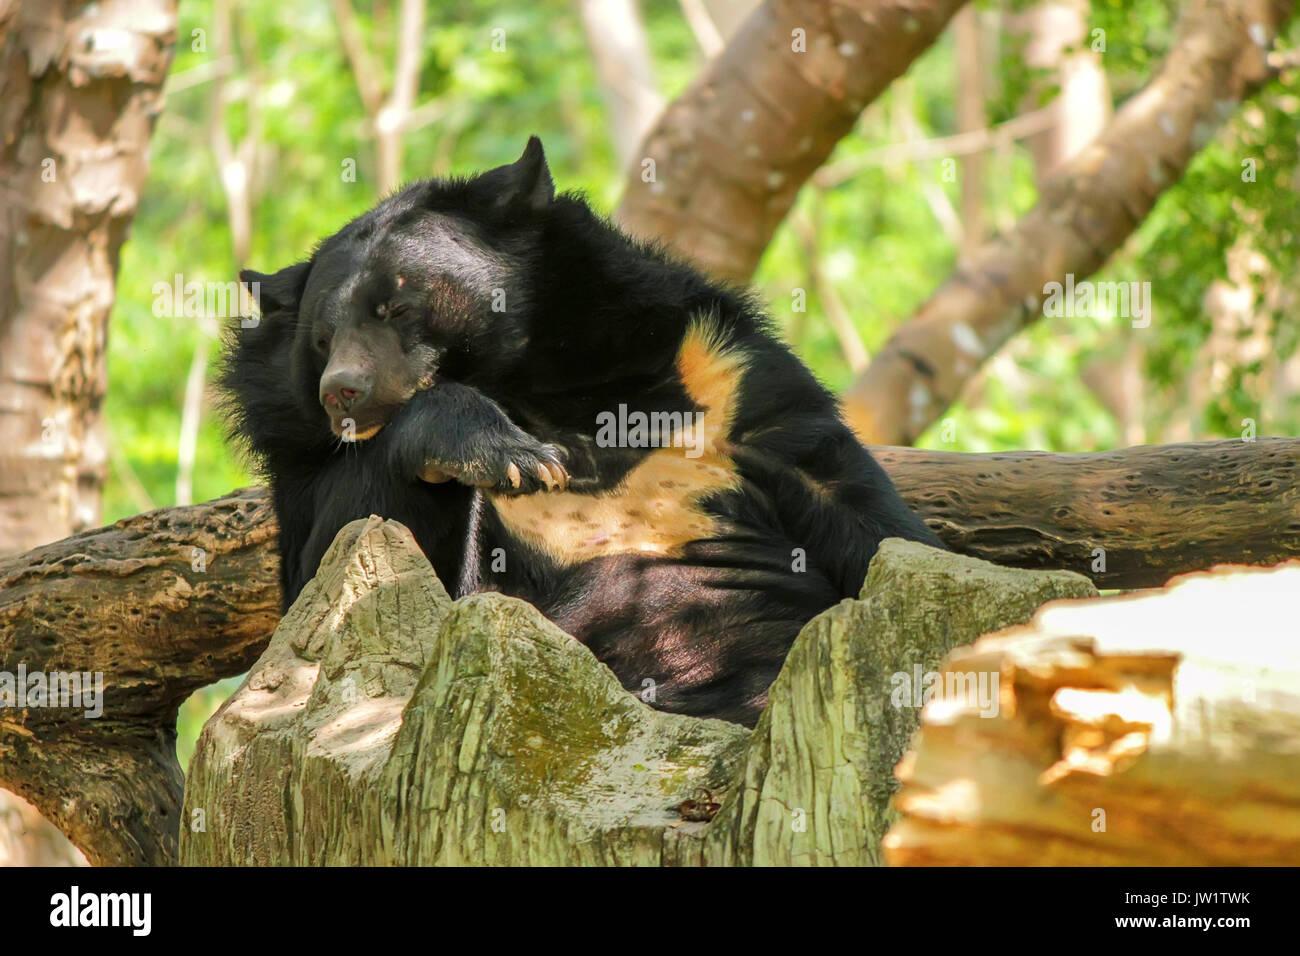 Asian black bear or Ursus thibetanus in zoo - Stock Image